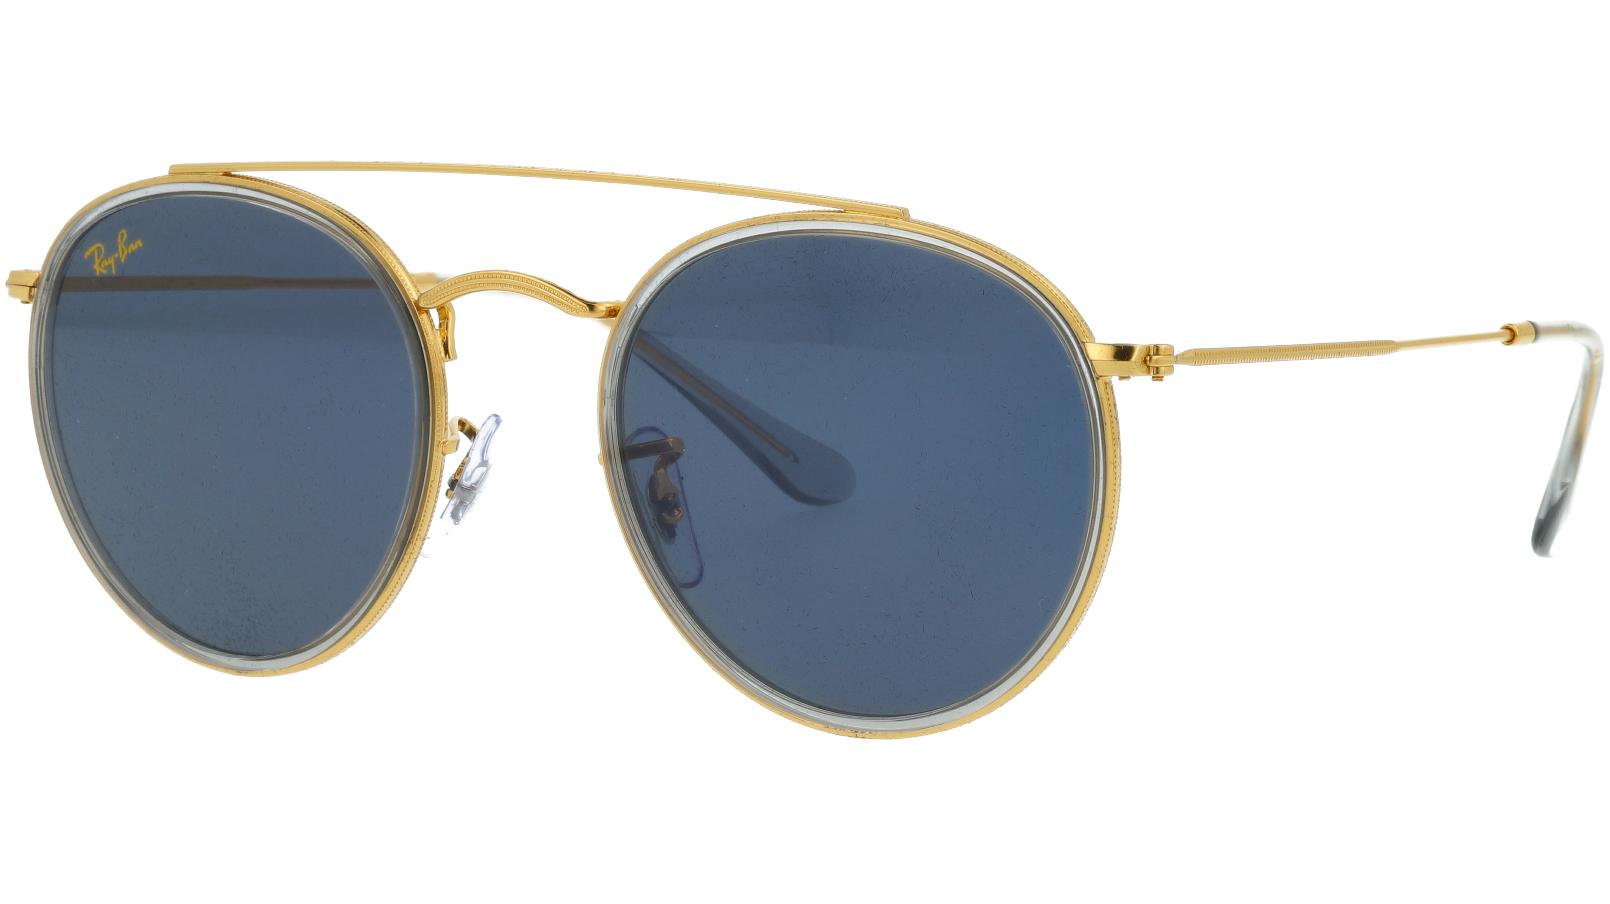 Ray-Ban RB3647N 9210R5 Legend Sunglasses